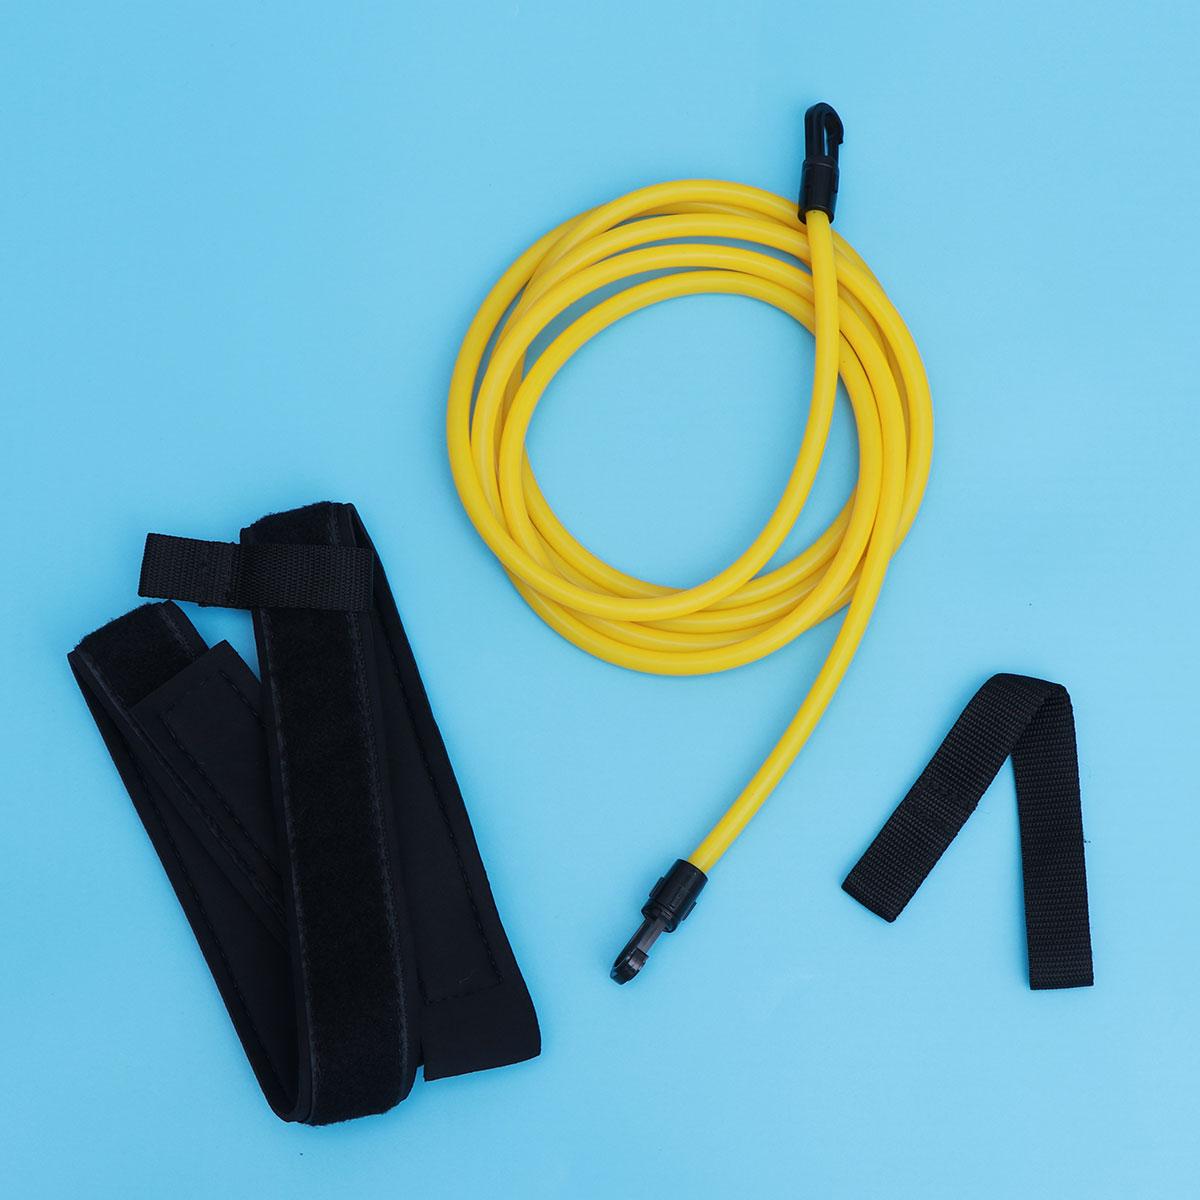 Swimming Resistance Belt Set Swim Training Band Swim Elastic Exerciser Belt With One Waist Strapk One Loop One Mesh Bag